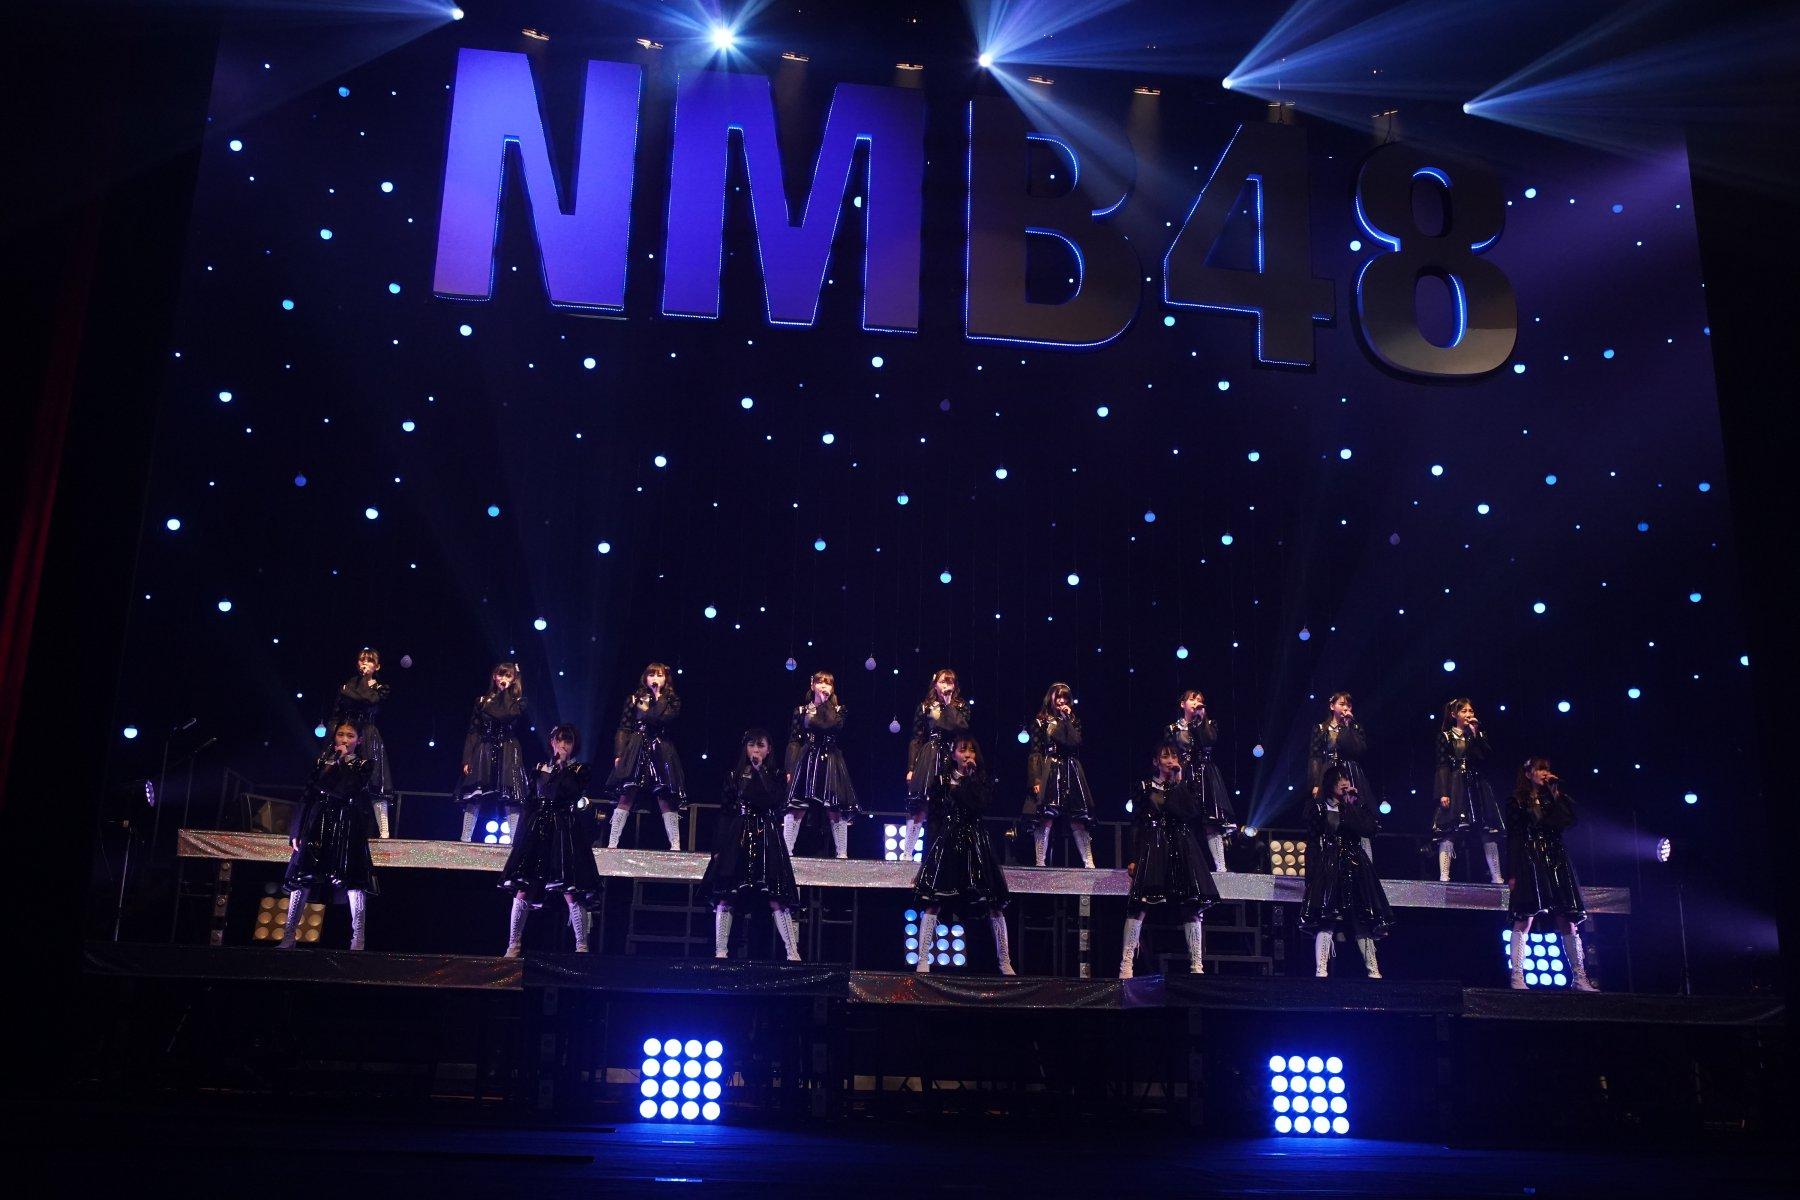 【NMB48】4月16日NMB48近畿十番勝負2019・チームBⅡ@神戸国際会館こくさいホールの画像